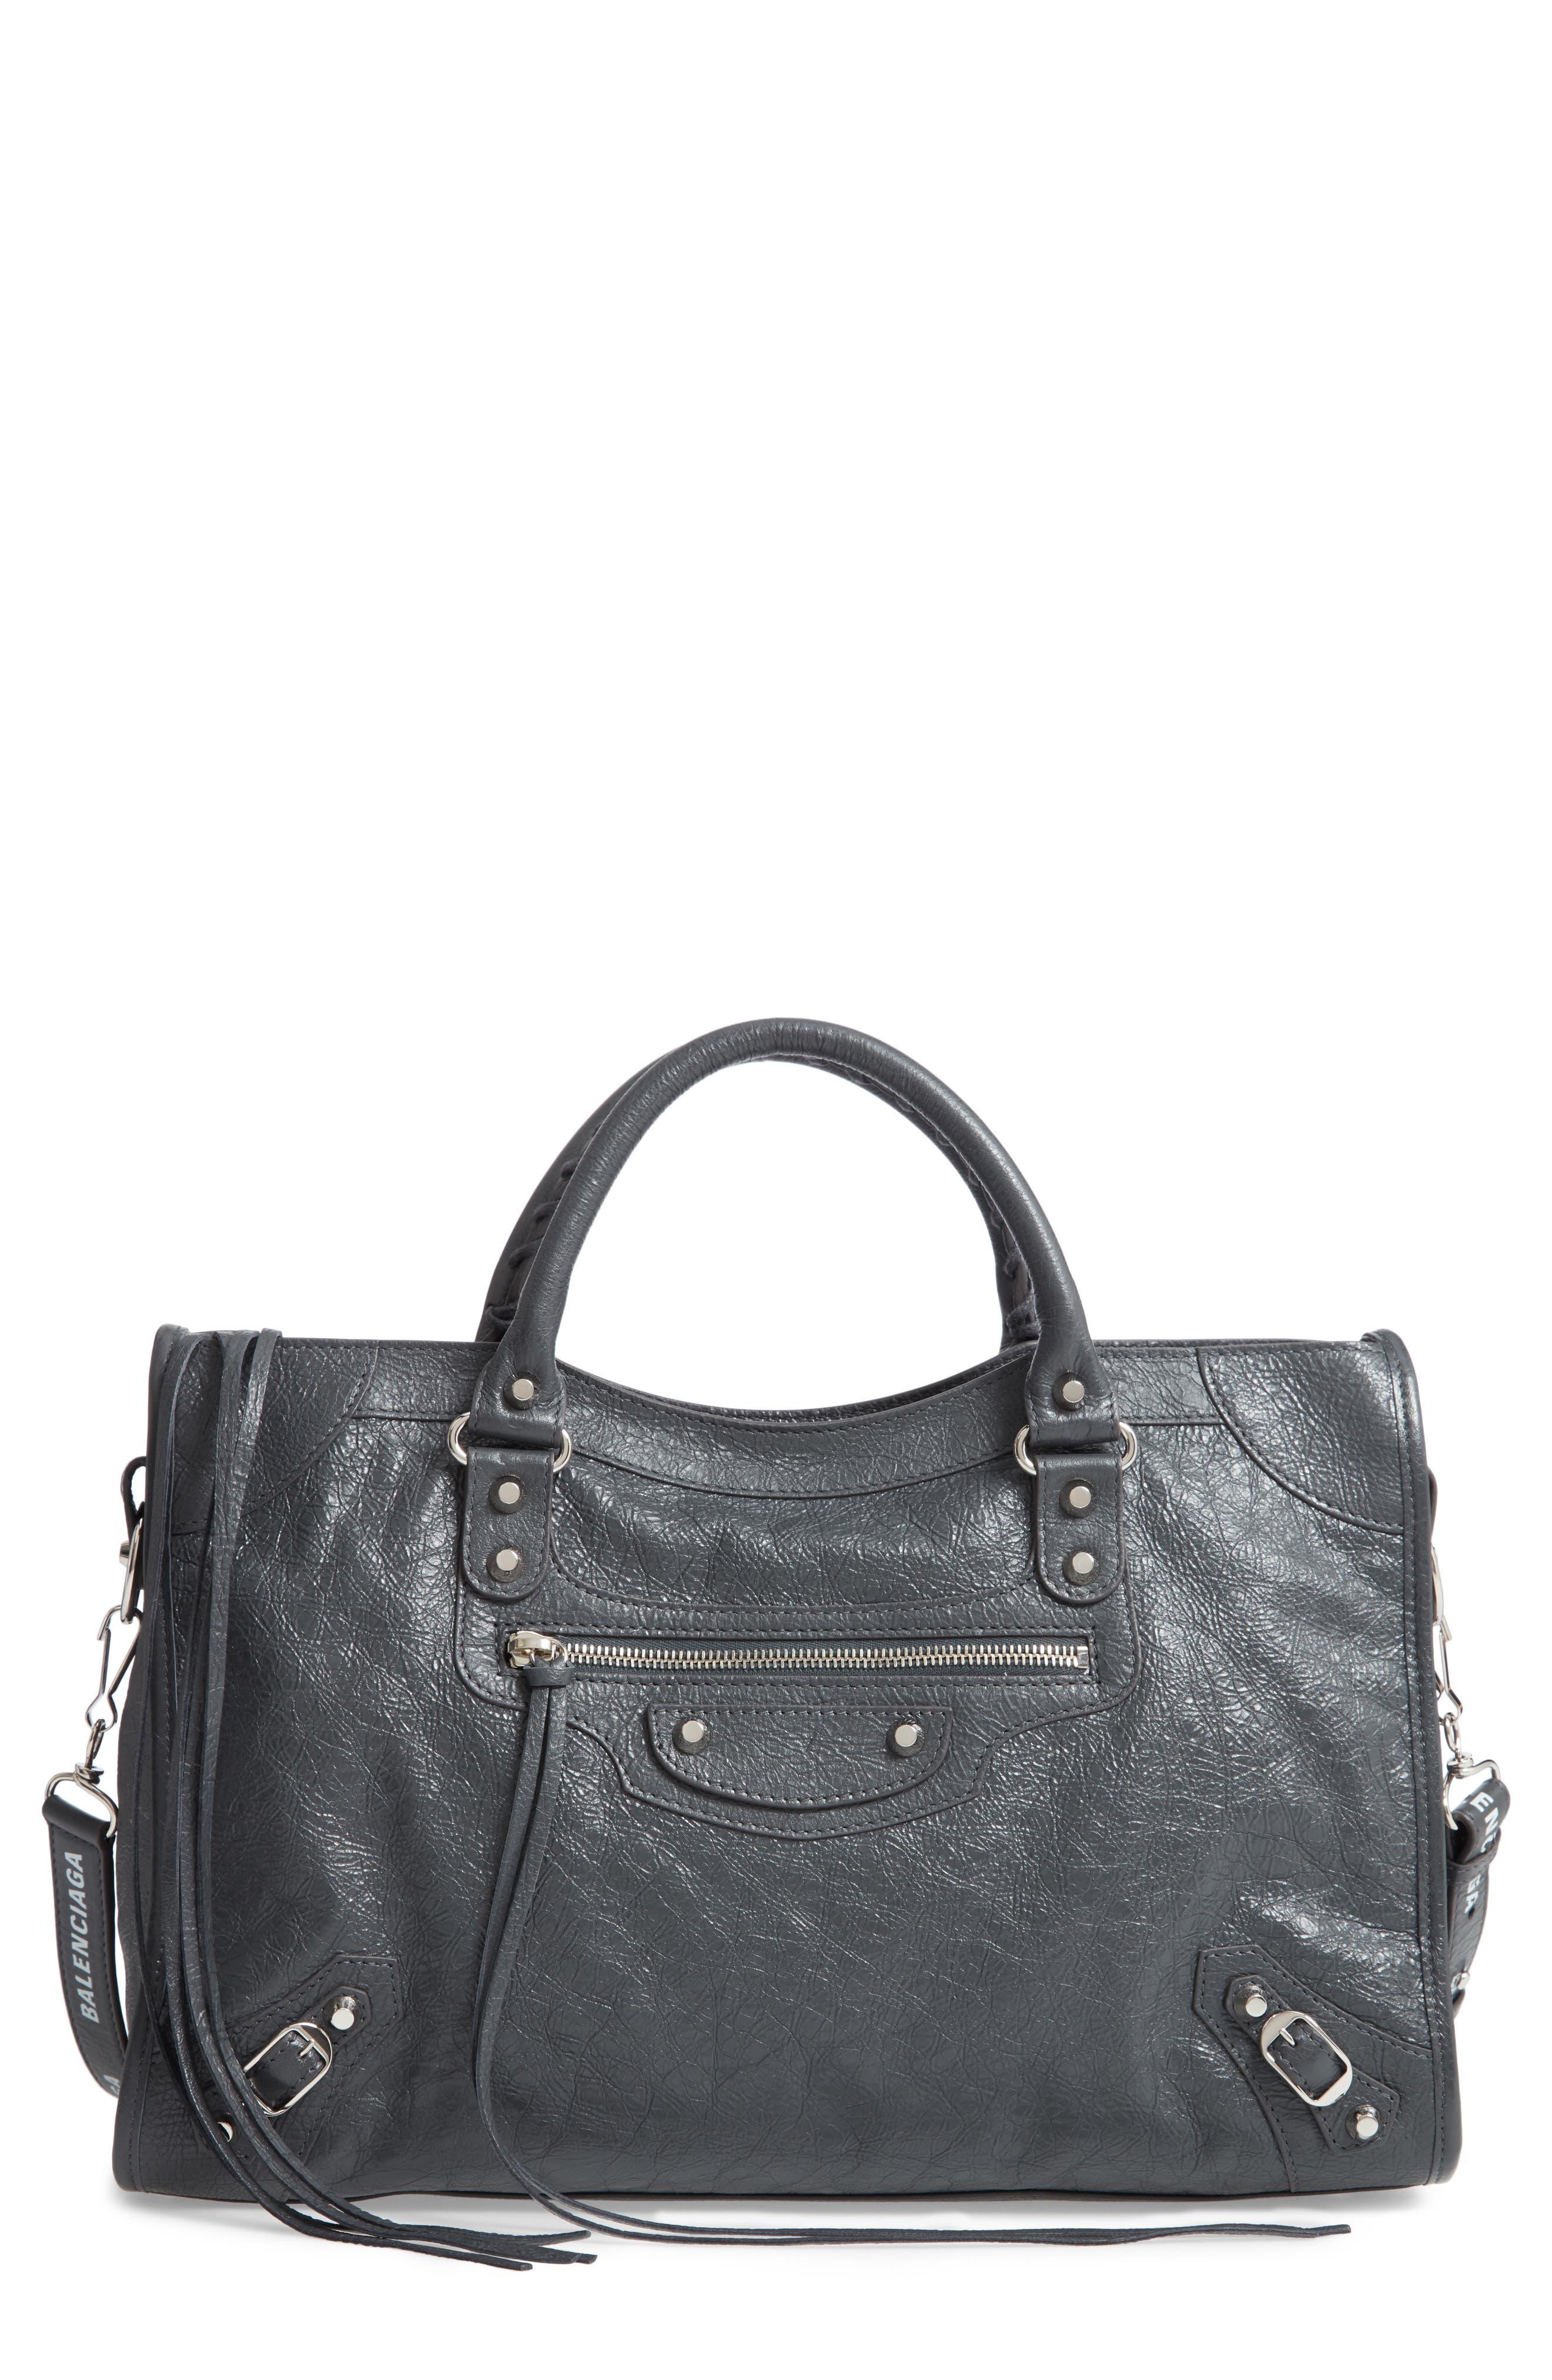 aef5fc660b Balenciaga Tote Bags for Women  Leather